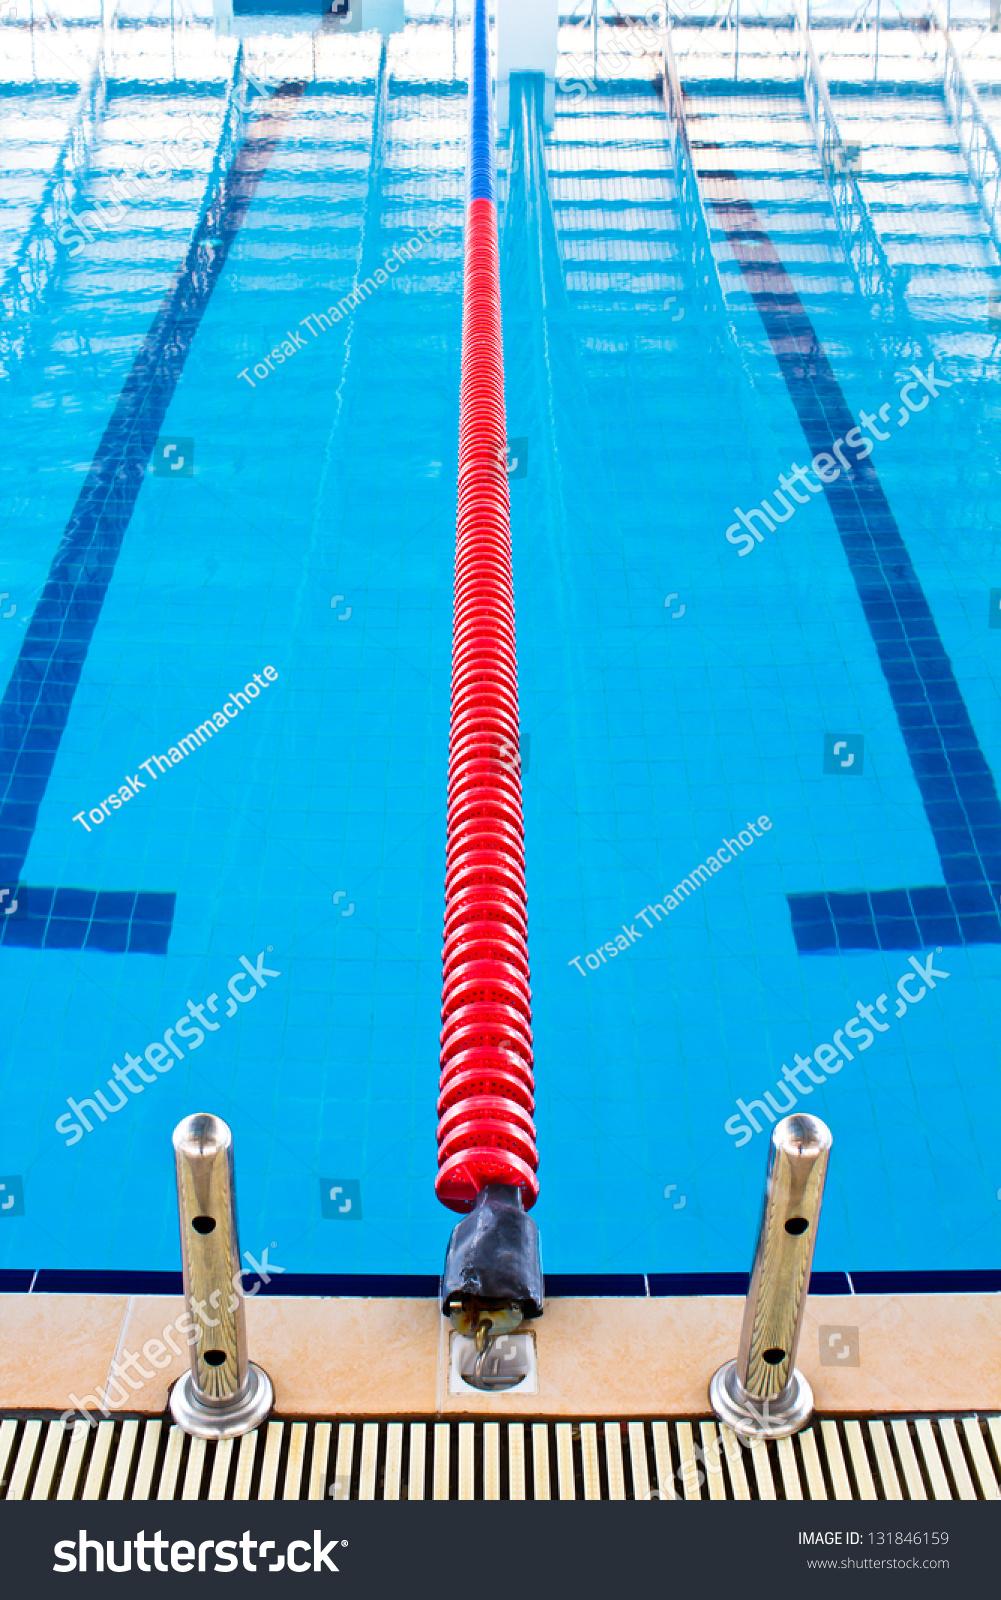 Lane Ropes Swimming Pool Stock Photo 131846159 Shutterstock